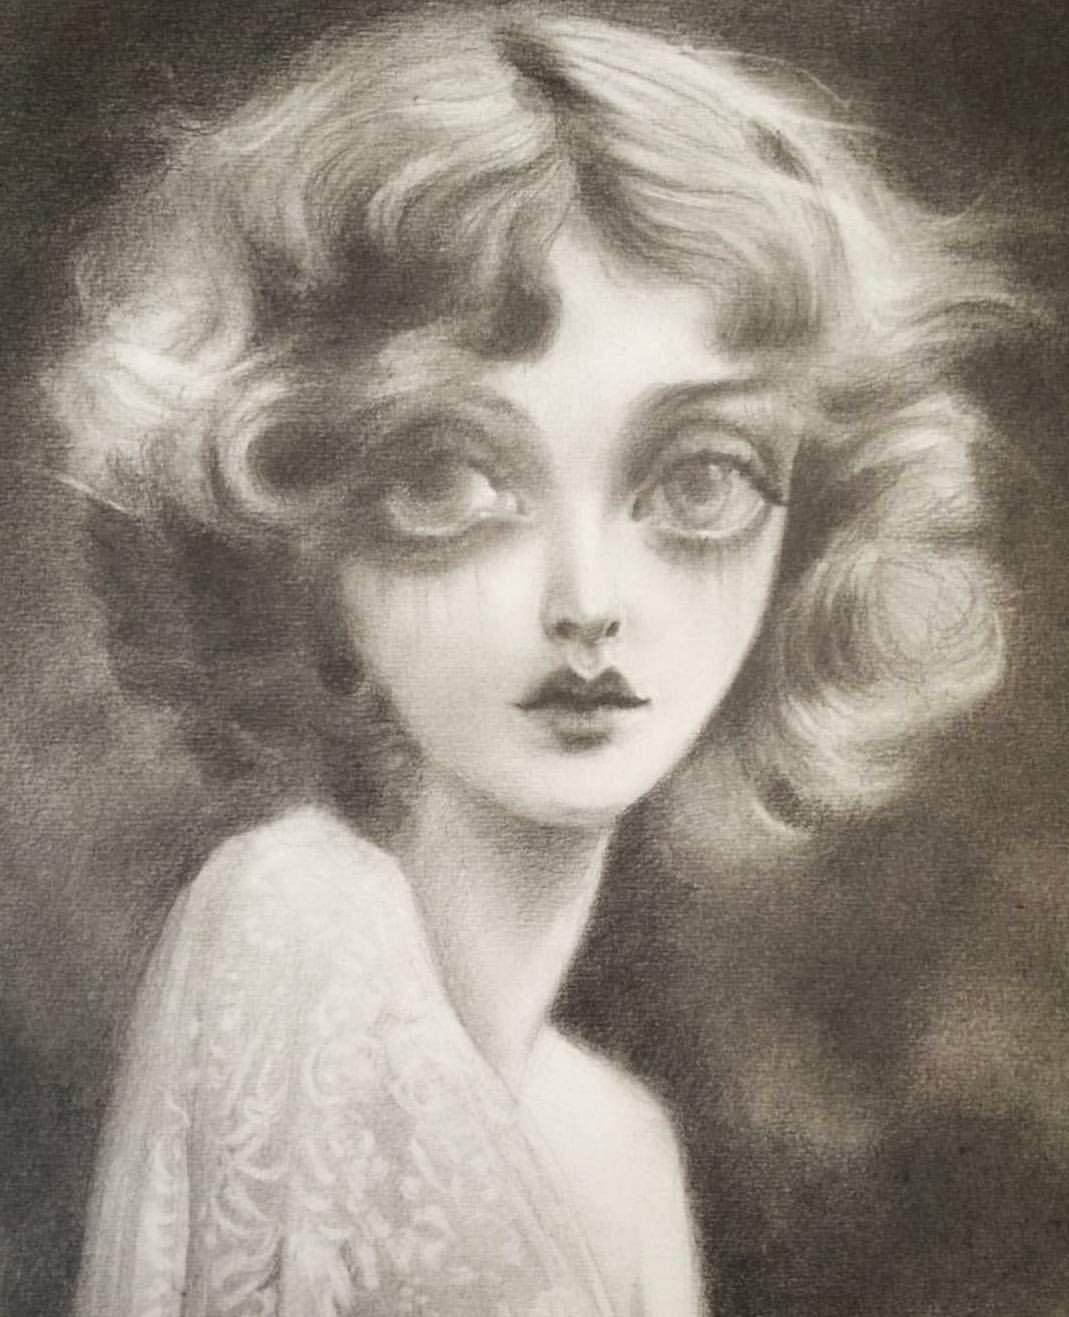 This portrait of Mary Nolan is bit of a departure from @dustinbailard's vibrantly cooked vixens, but utterly hypnotic. ❤️ * * * * #marynolan #artoftheday #artlovers #artlover #contemporaryart #shewalkssoftly #instaart #artwork #art #artsy #artists...